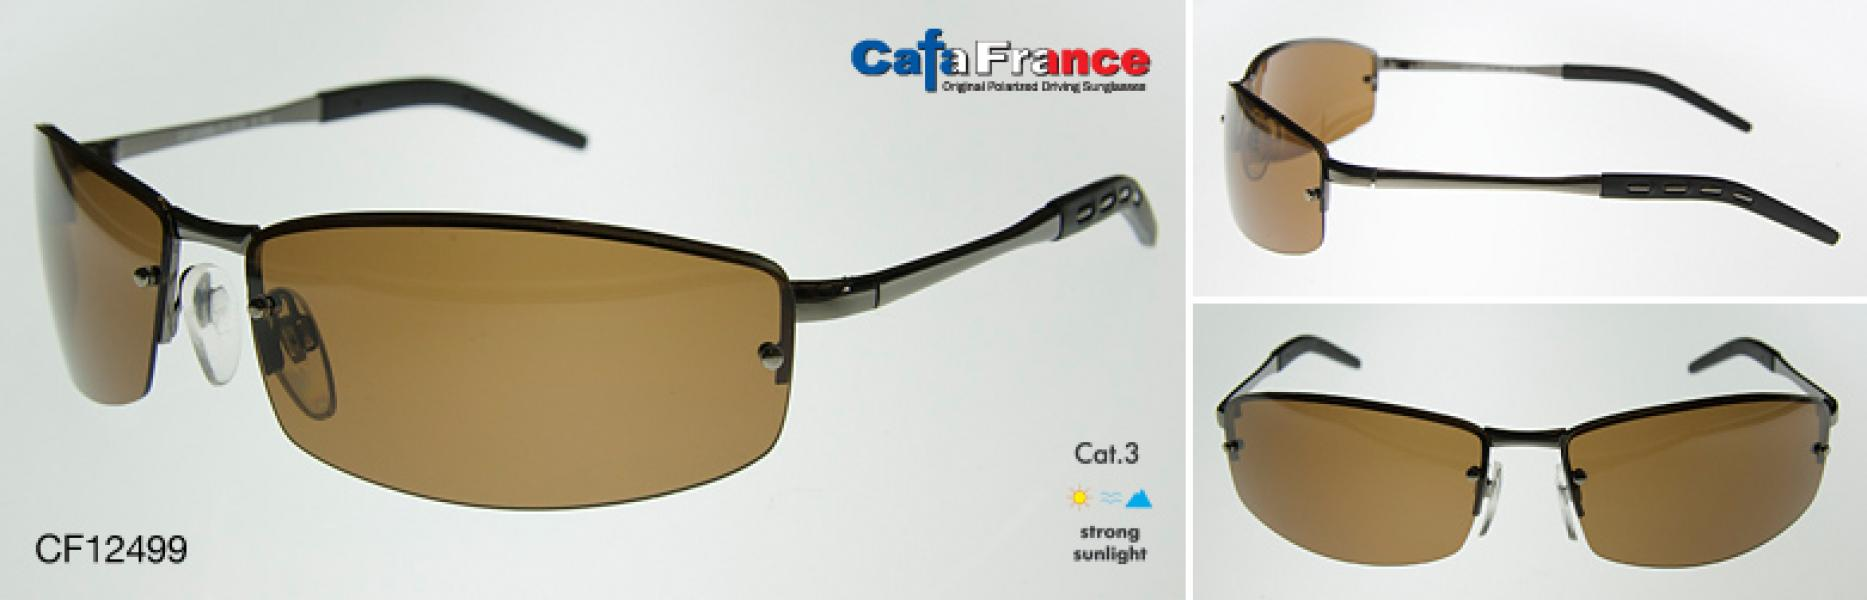 ���� ��������������� ������� Cafa France cf12499